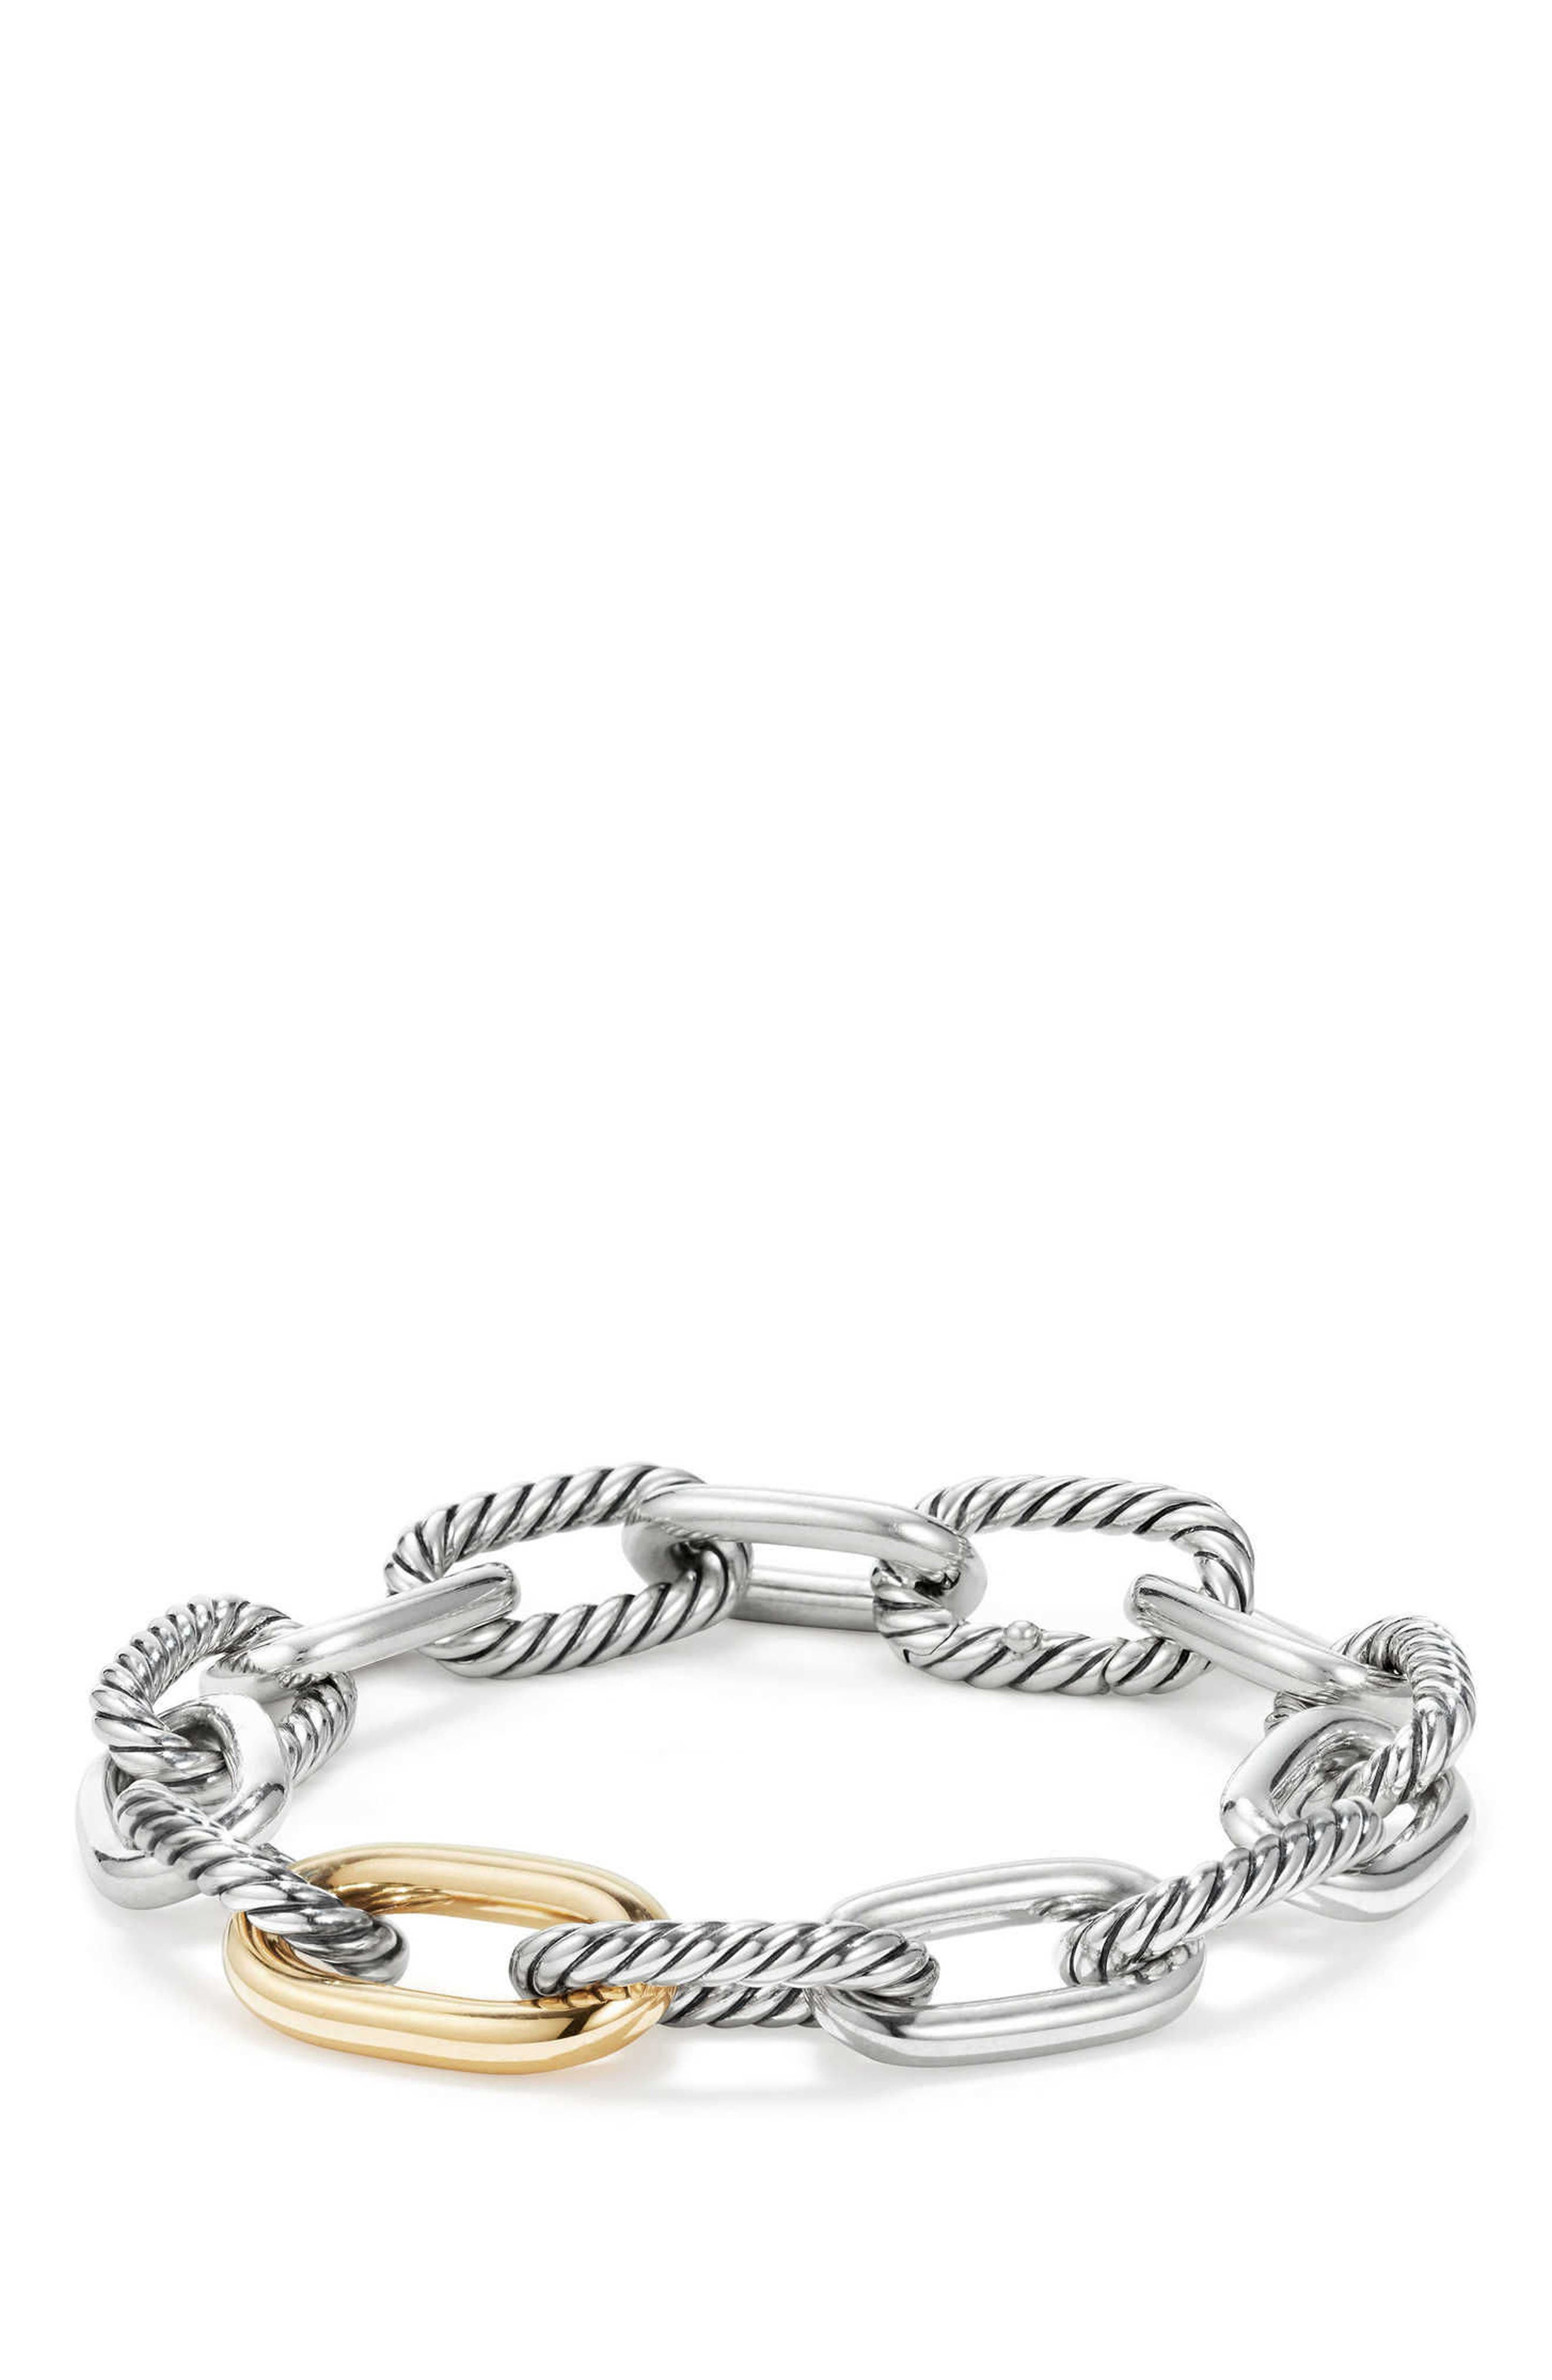 DY Madison Chain Medium Bracelet,                         Main,                         color, GOLD/ SILVER